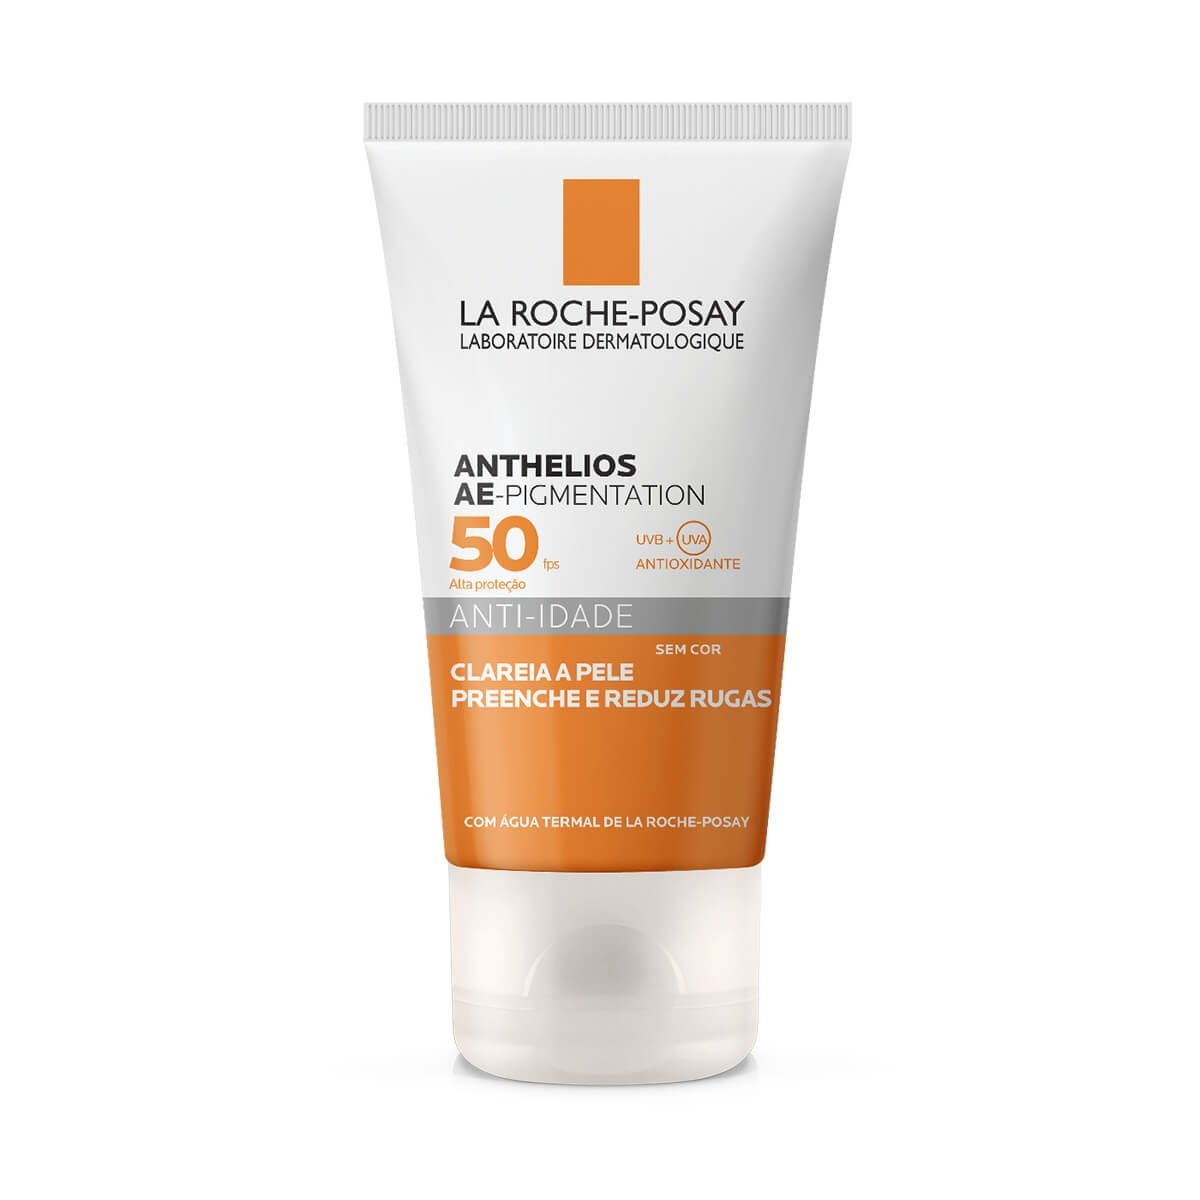 Protetor Solar La Roche-Posay Anthelios AE-Pigmentation FPS 50 Anti-idade Facial com 40g 40g